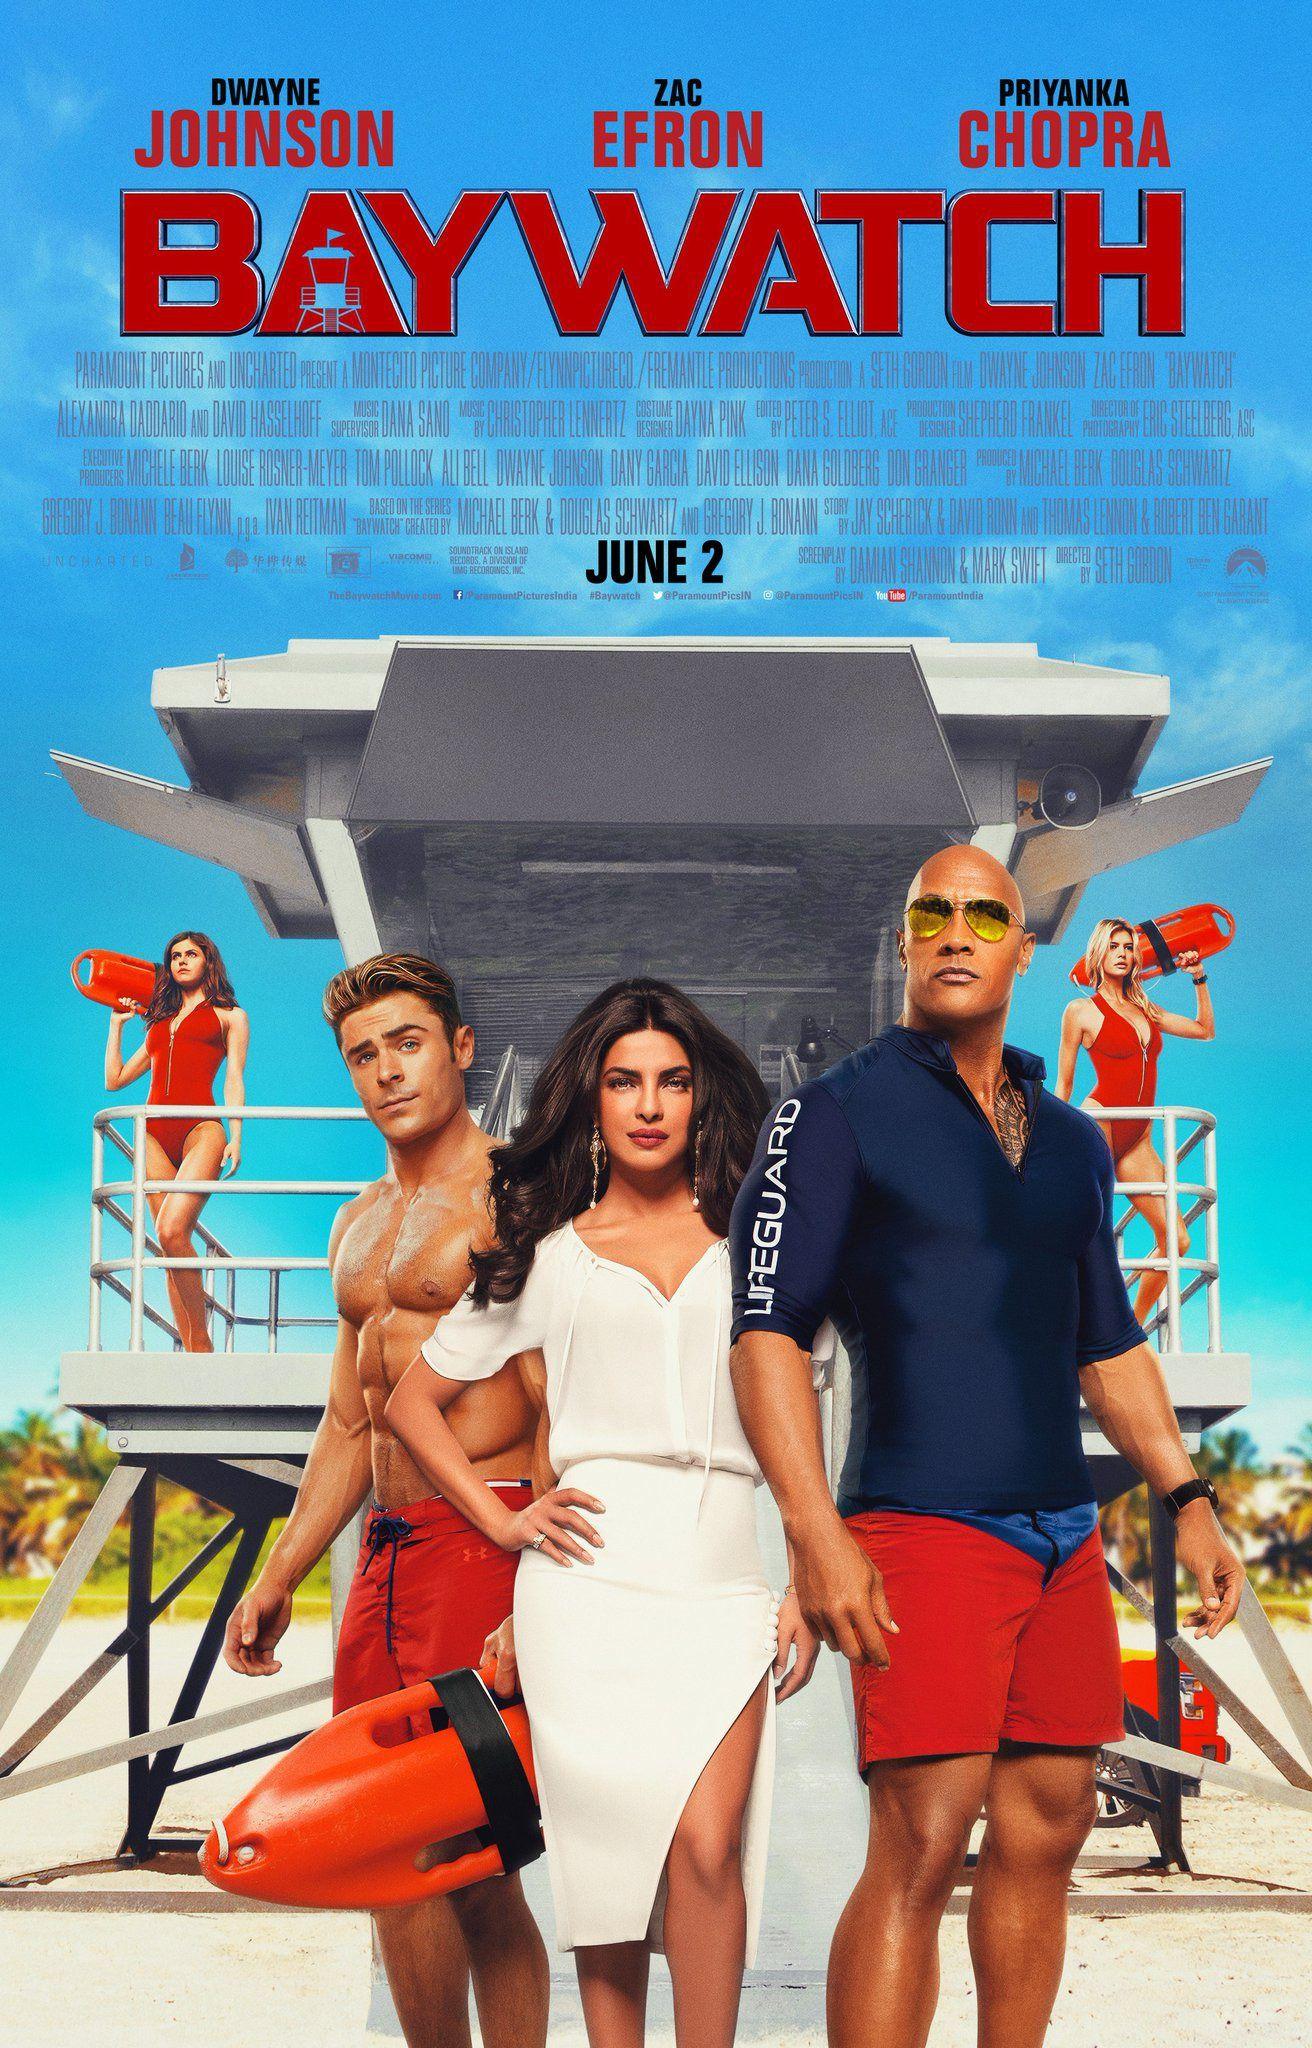 Baywatch In 2020 Baywatch Movie Baywatch 2017 Baywatch